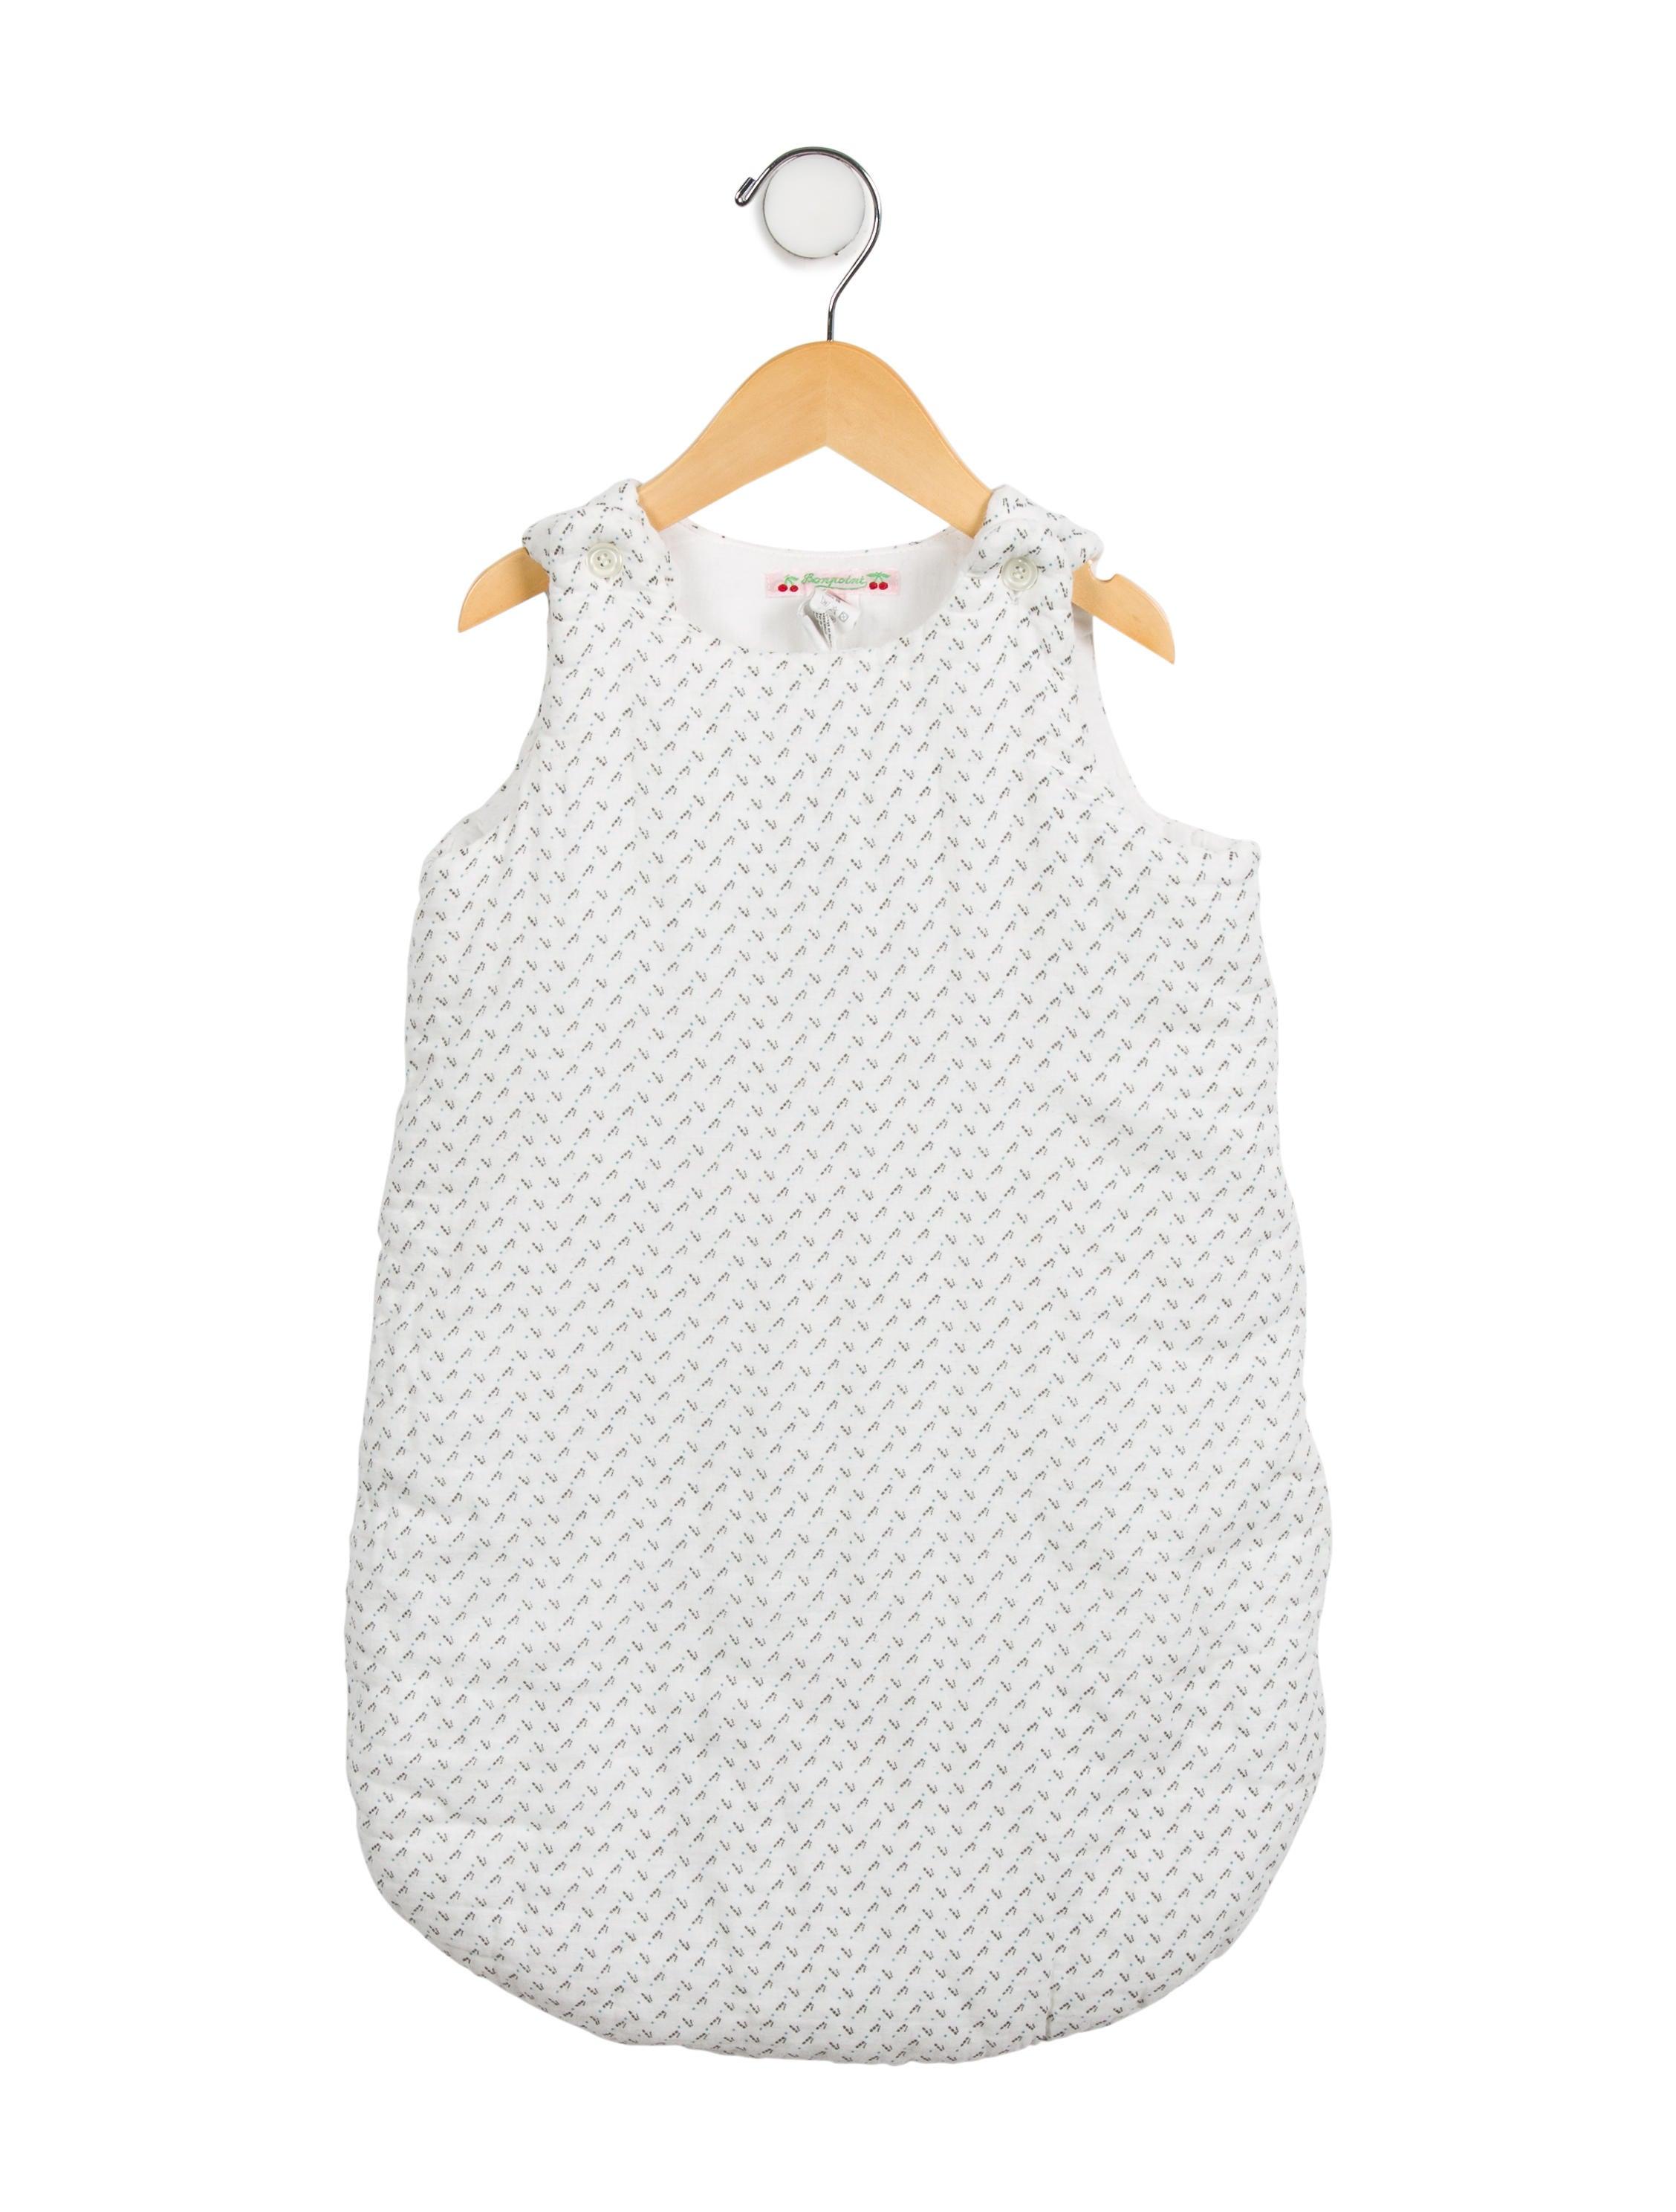 finest selection 3f6b8 060b0 Girls' Printed Sleep Sack